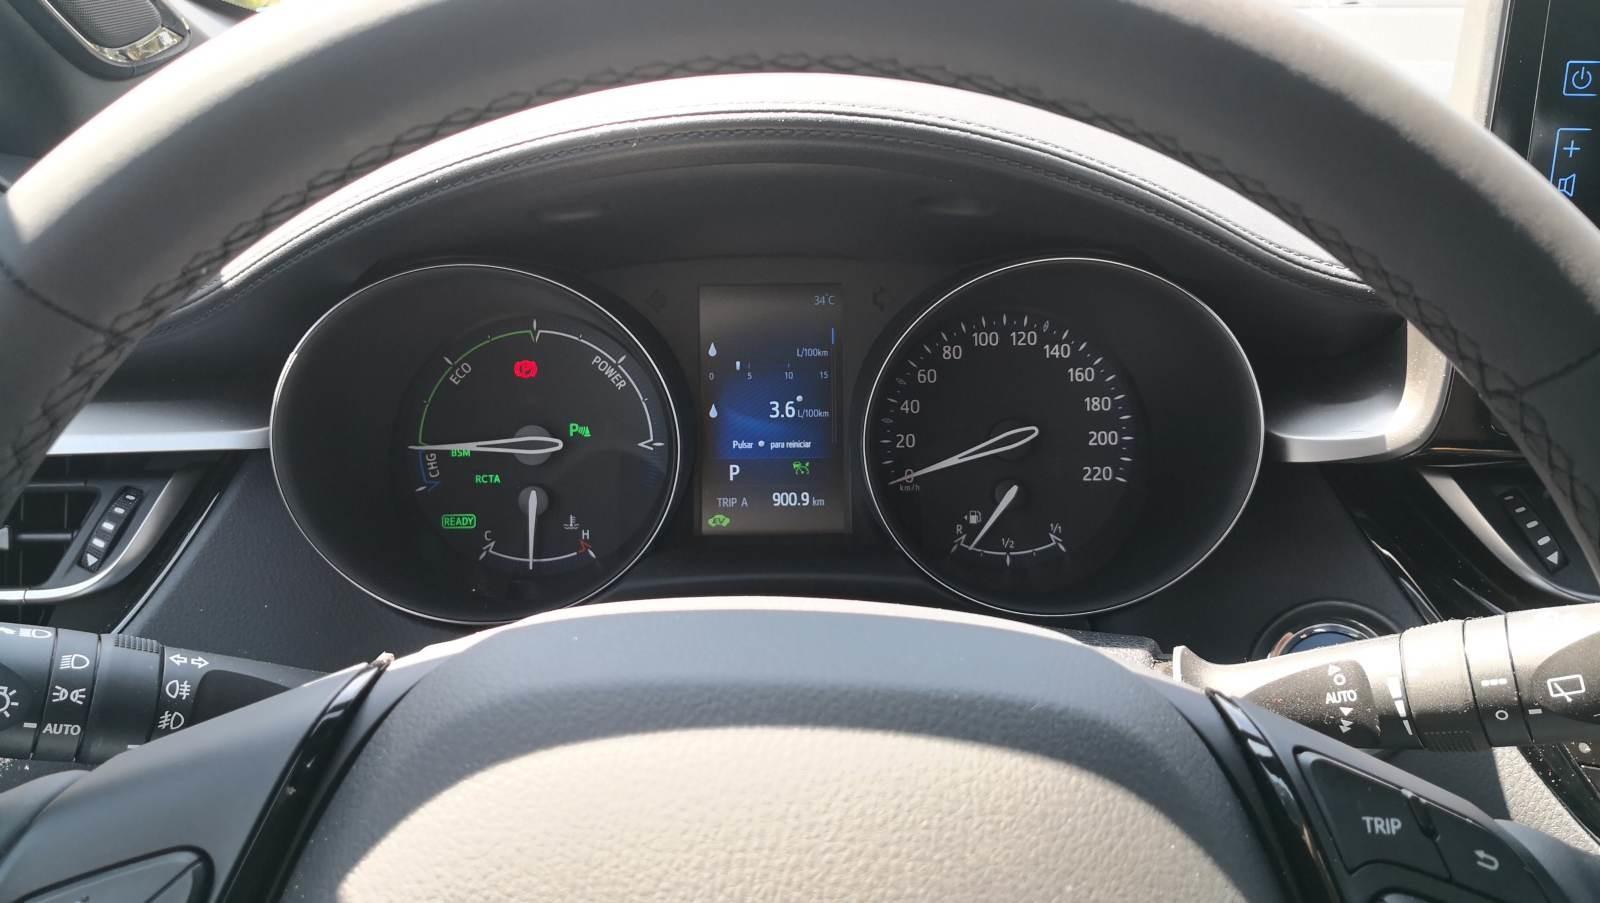 Foto de Toyota C-HR Dynamic Plus - Fotos interiores y detalles (6/15)